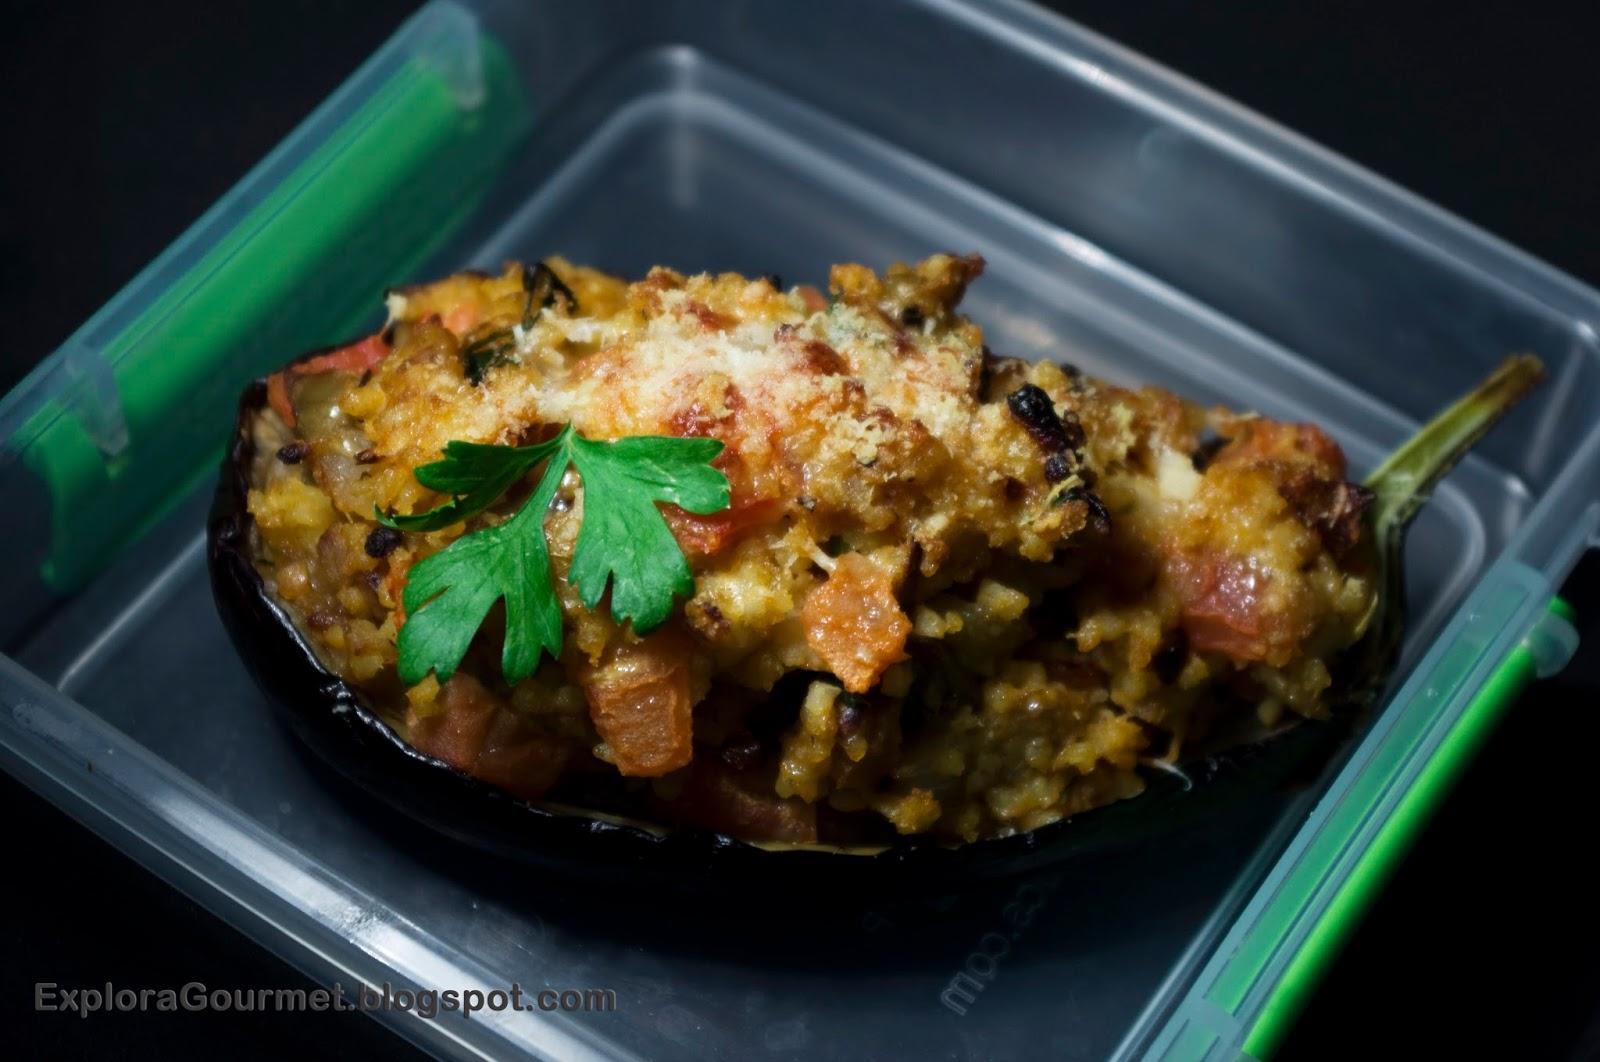 Berenjena rellena de mijo y tomate - lunch box